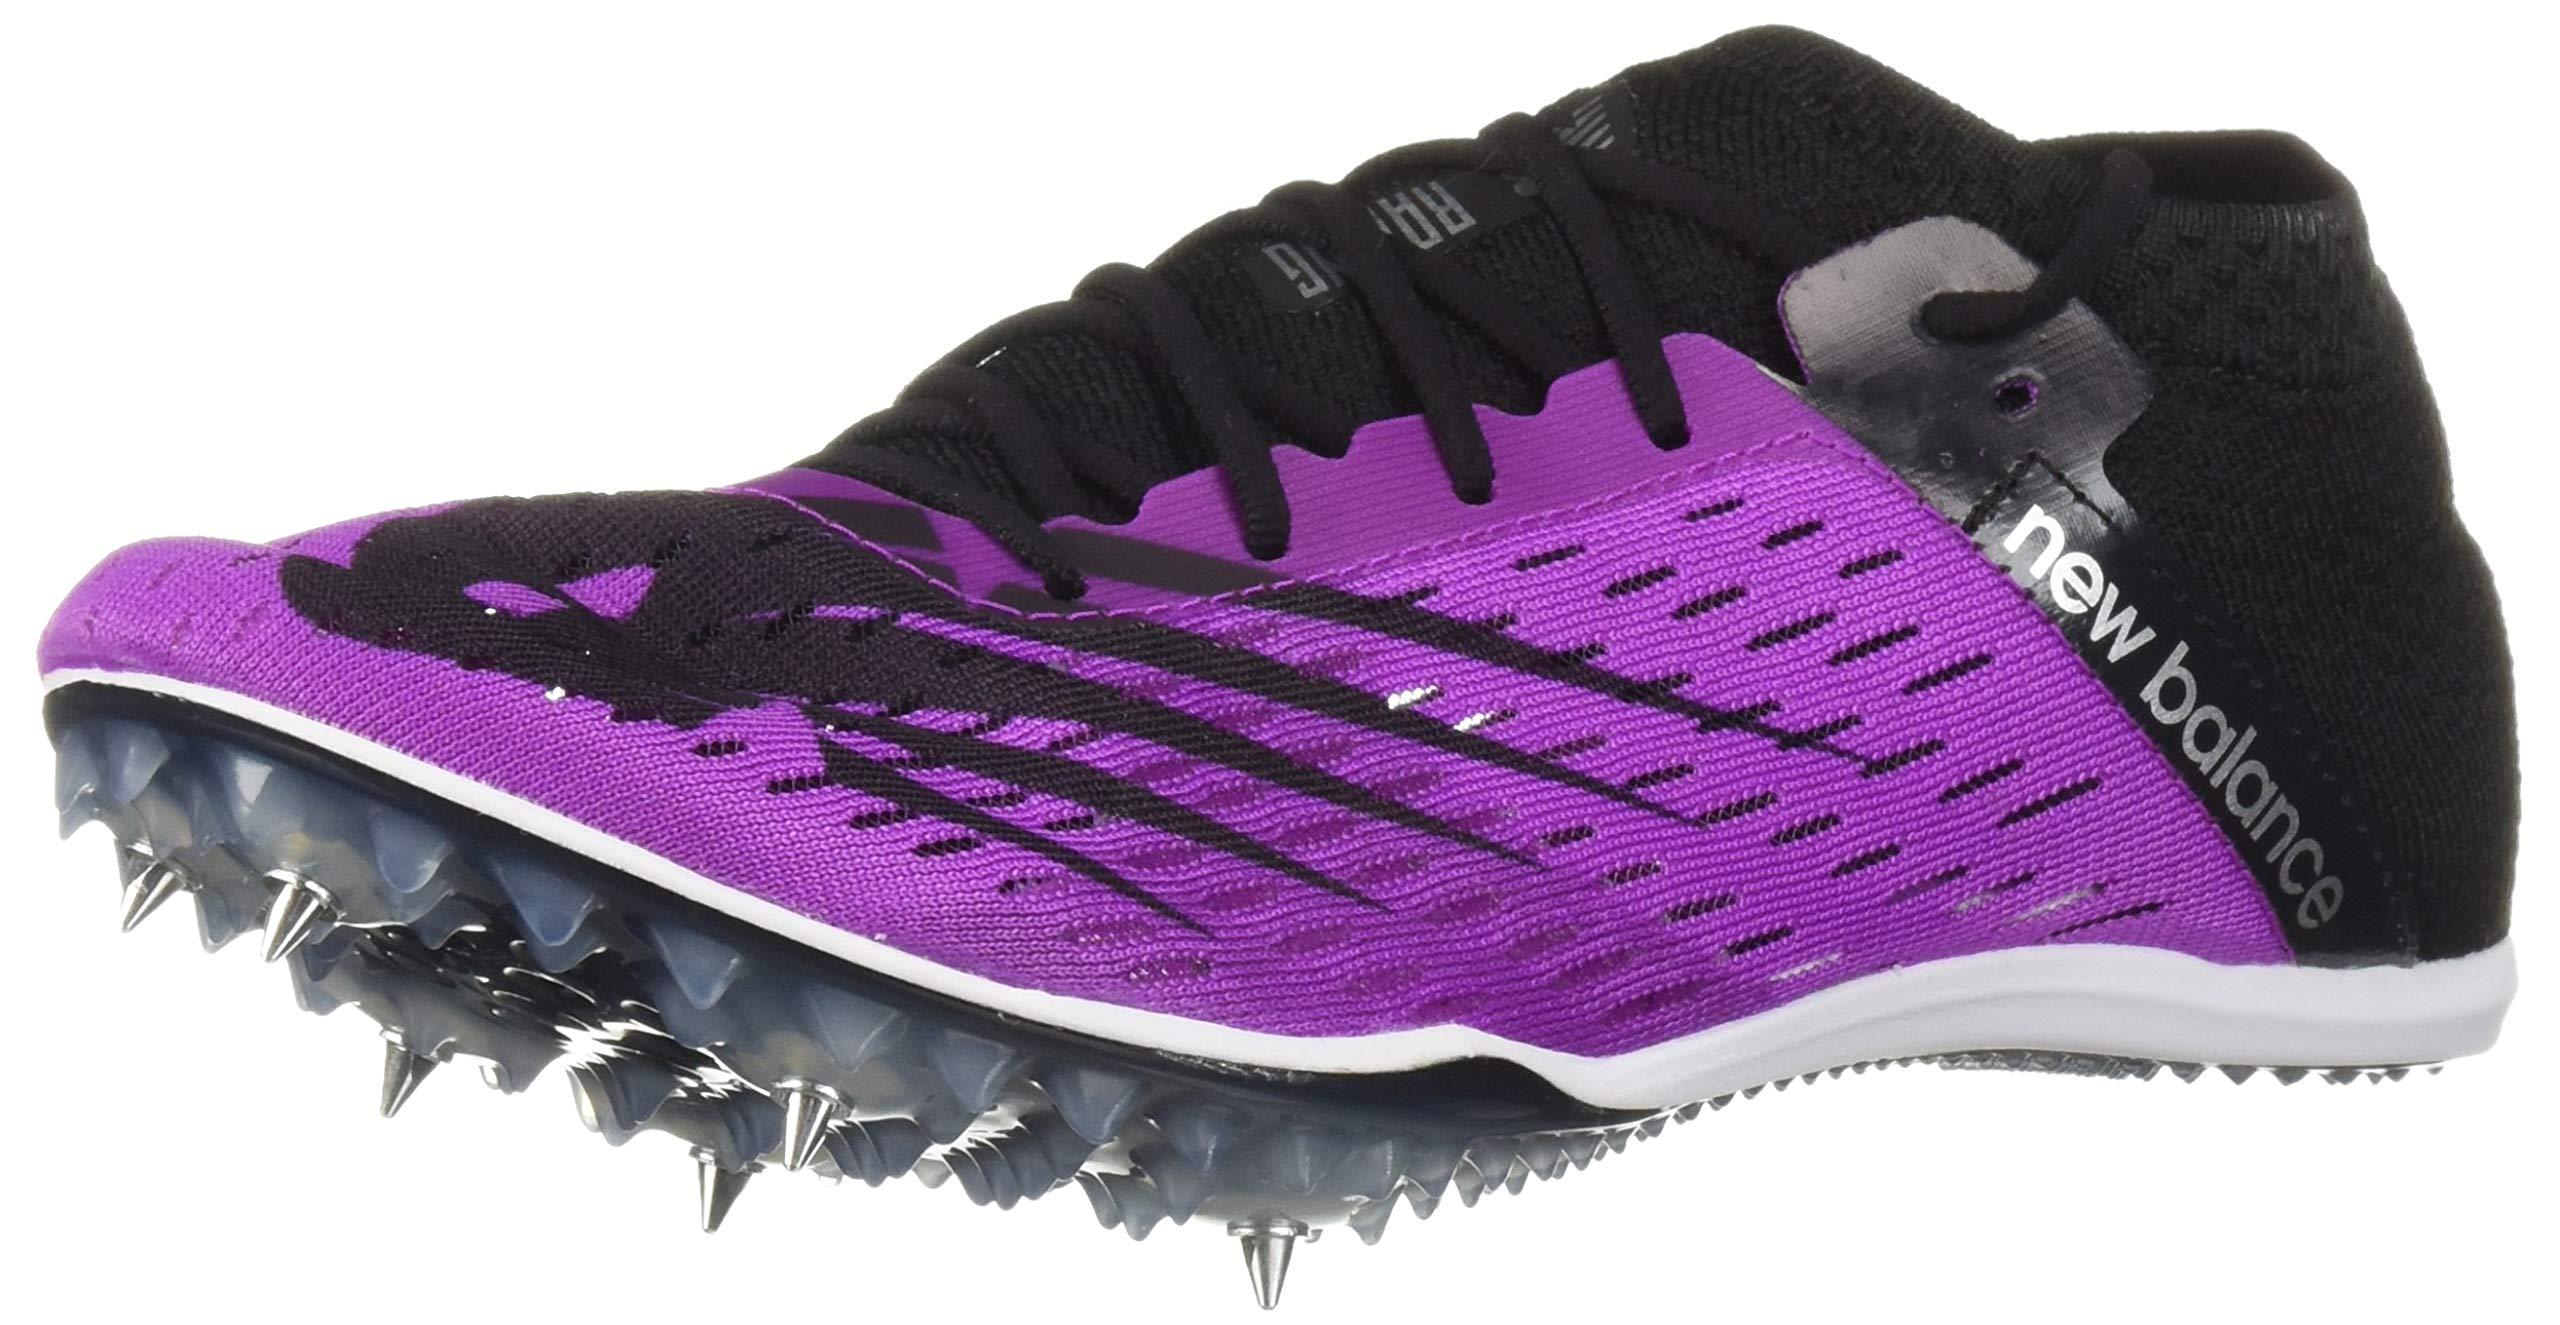 New Balance Women's 800v6 Track Shoe Voltage Violet/Black 8.5 B US by New Balance